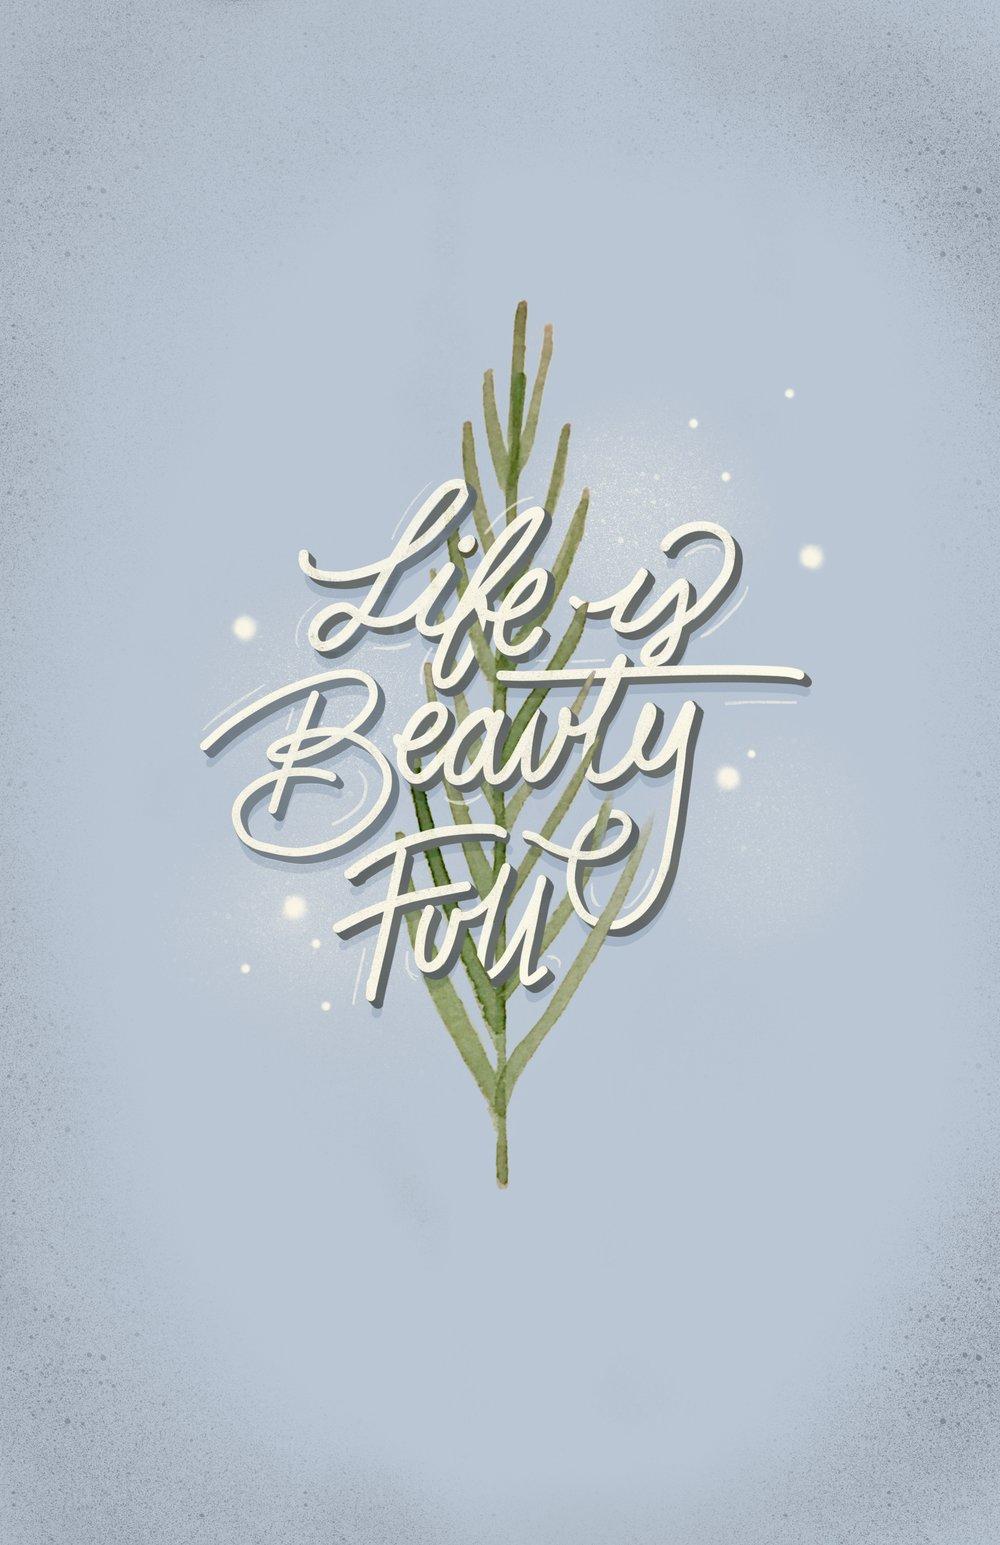 Life is Beauty Full -